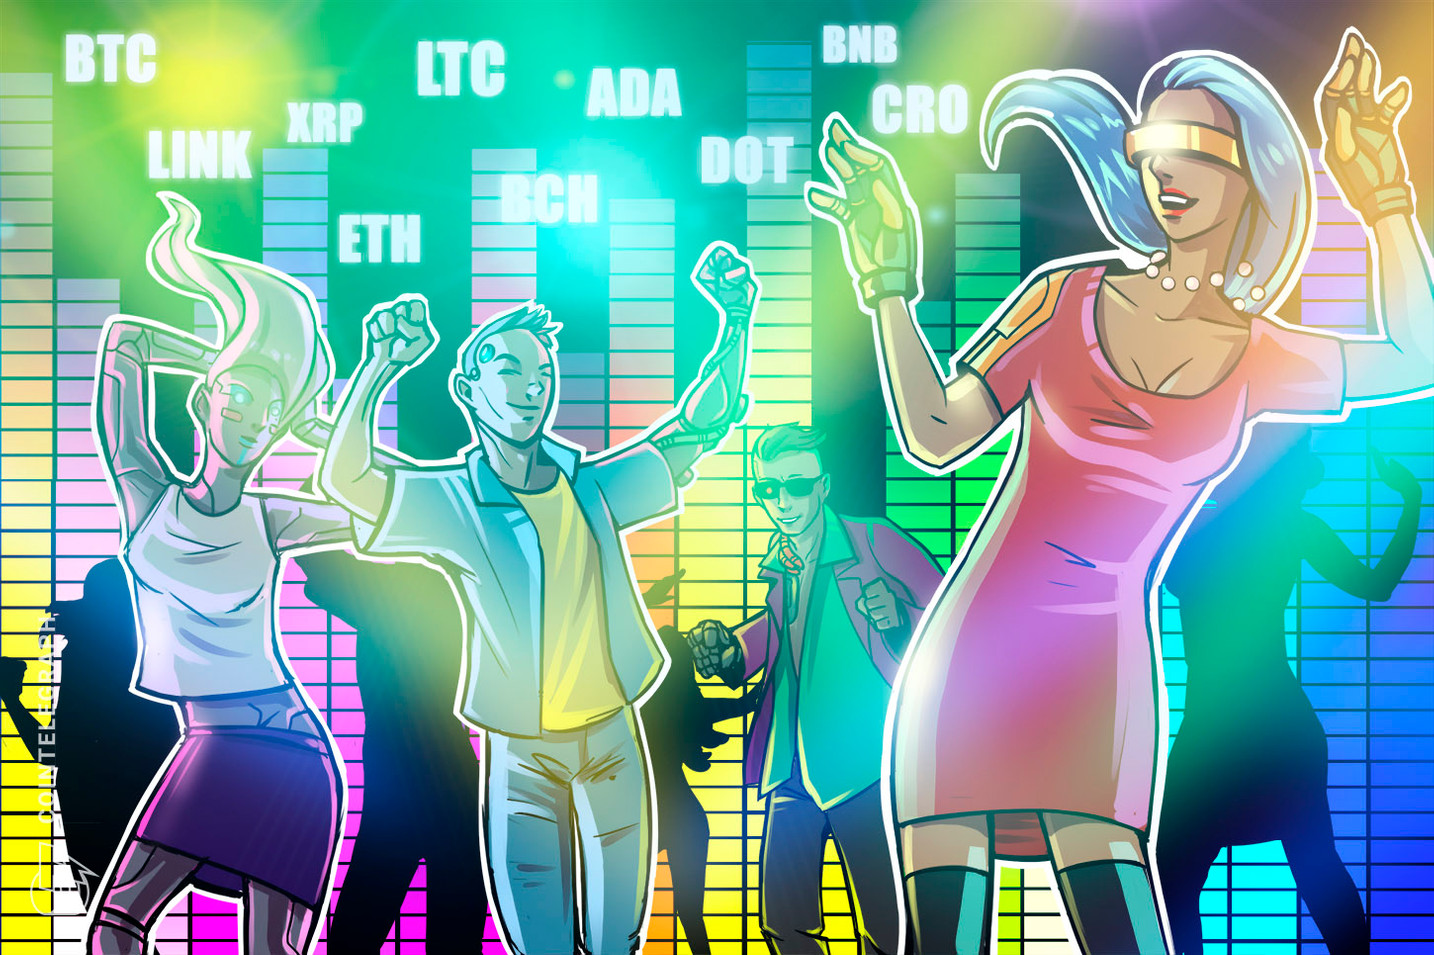 Análisis de precios al 10/5: BTC, ETH, XRP, BNB, BCH, DOT, LINK, CRO, LTC, ADA